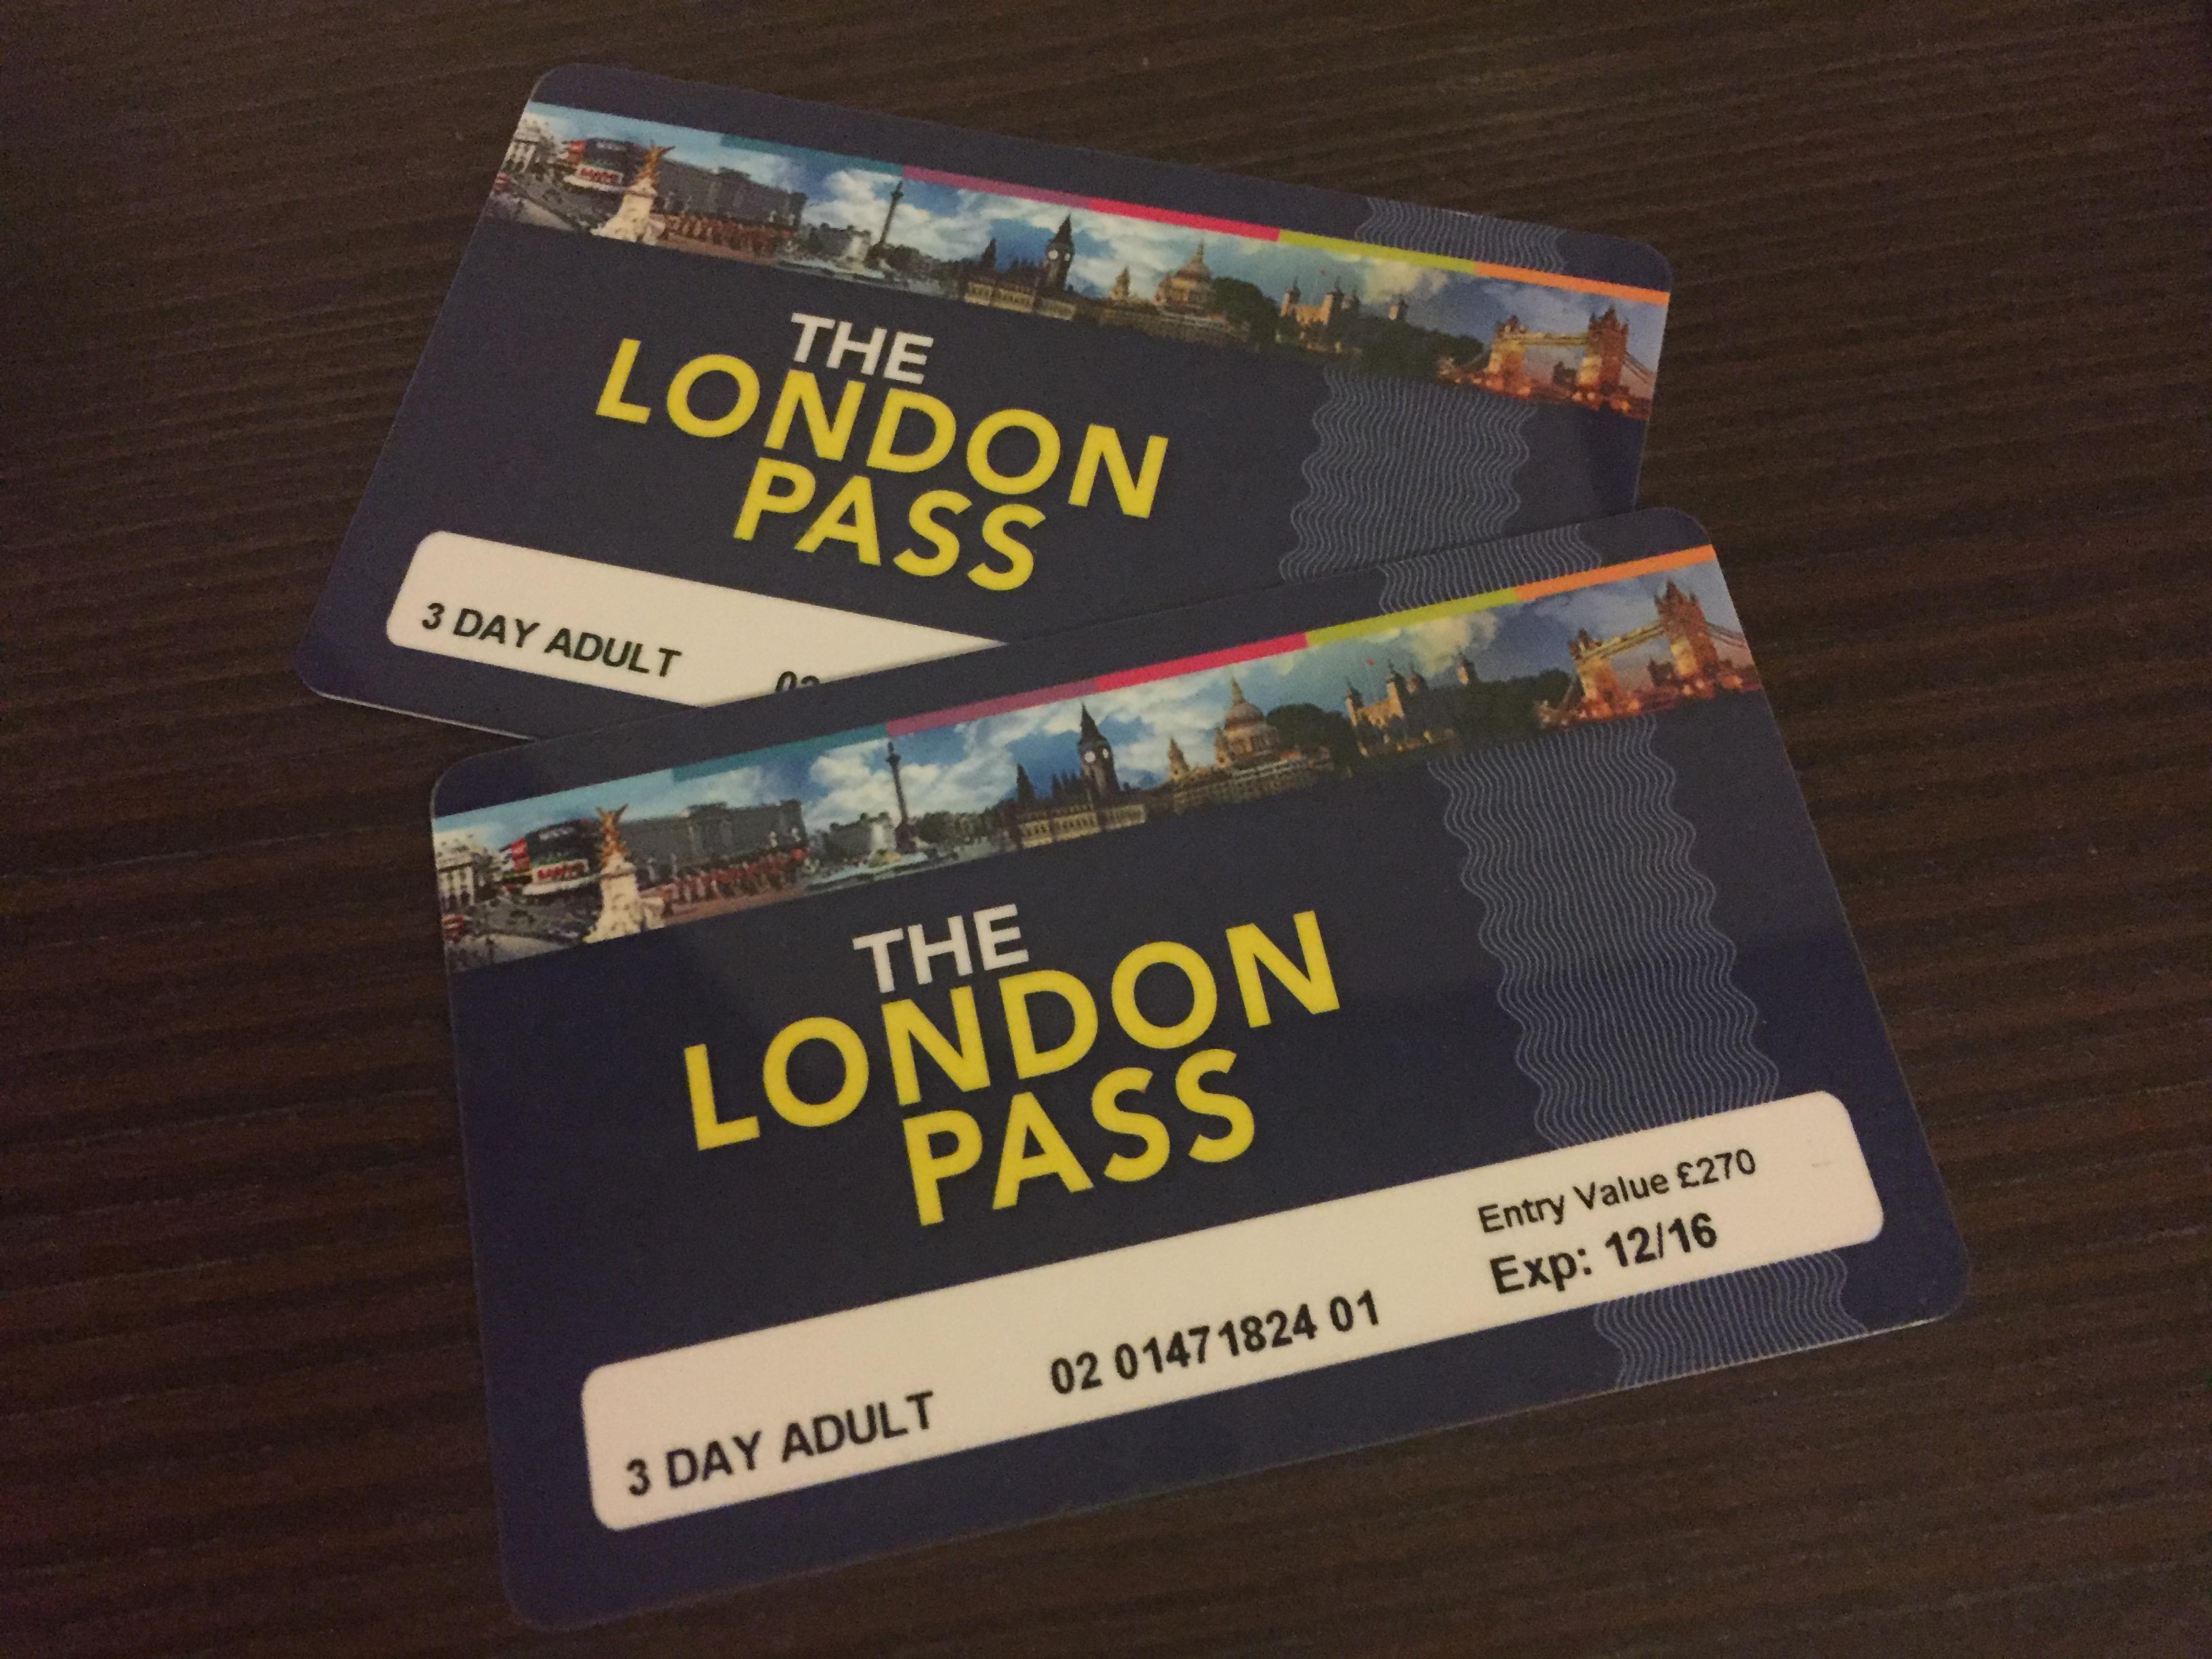 img 6846 - La tarjeta de atracciones turísticas London Pass